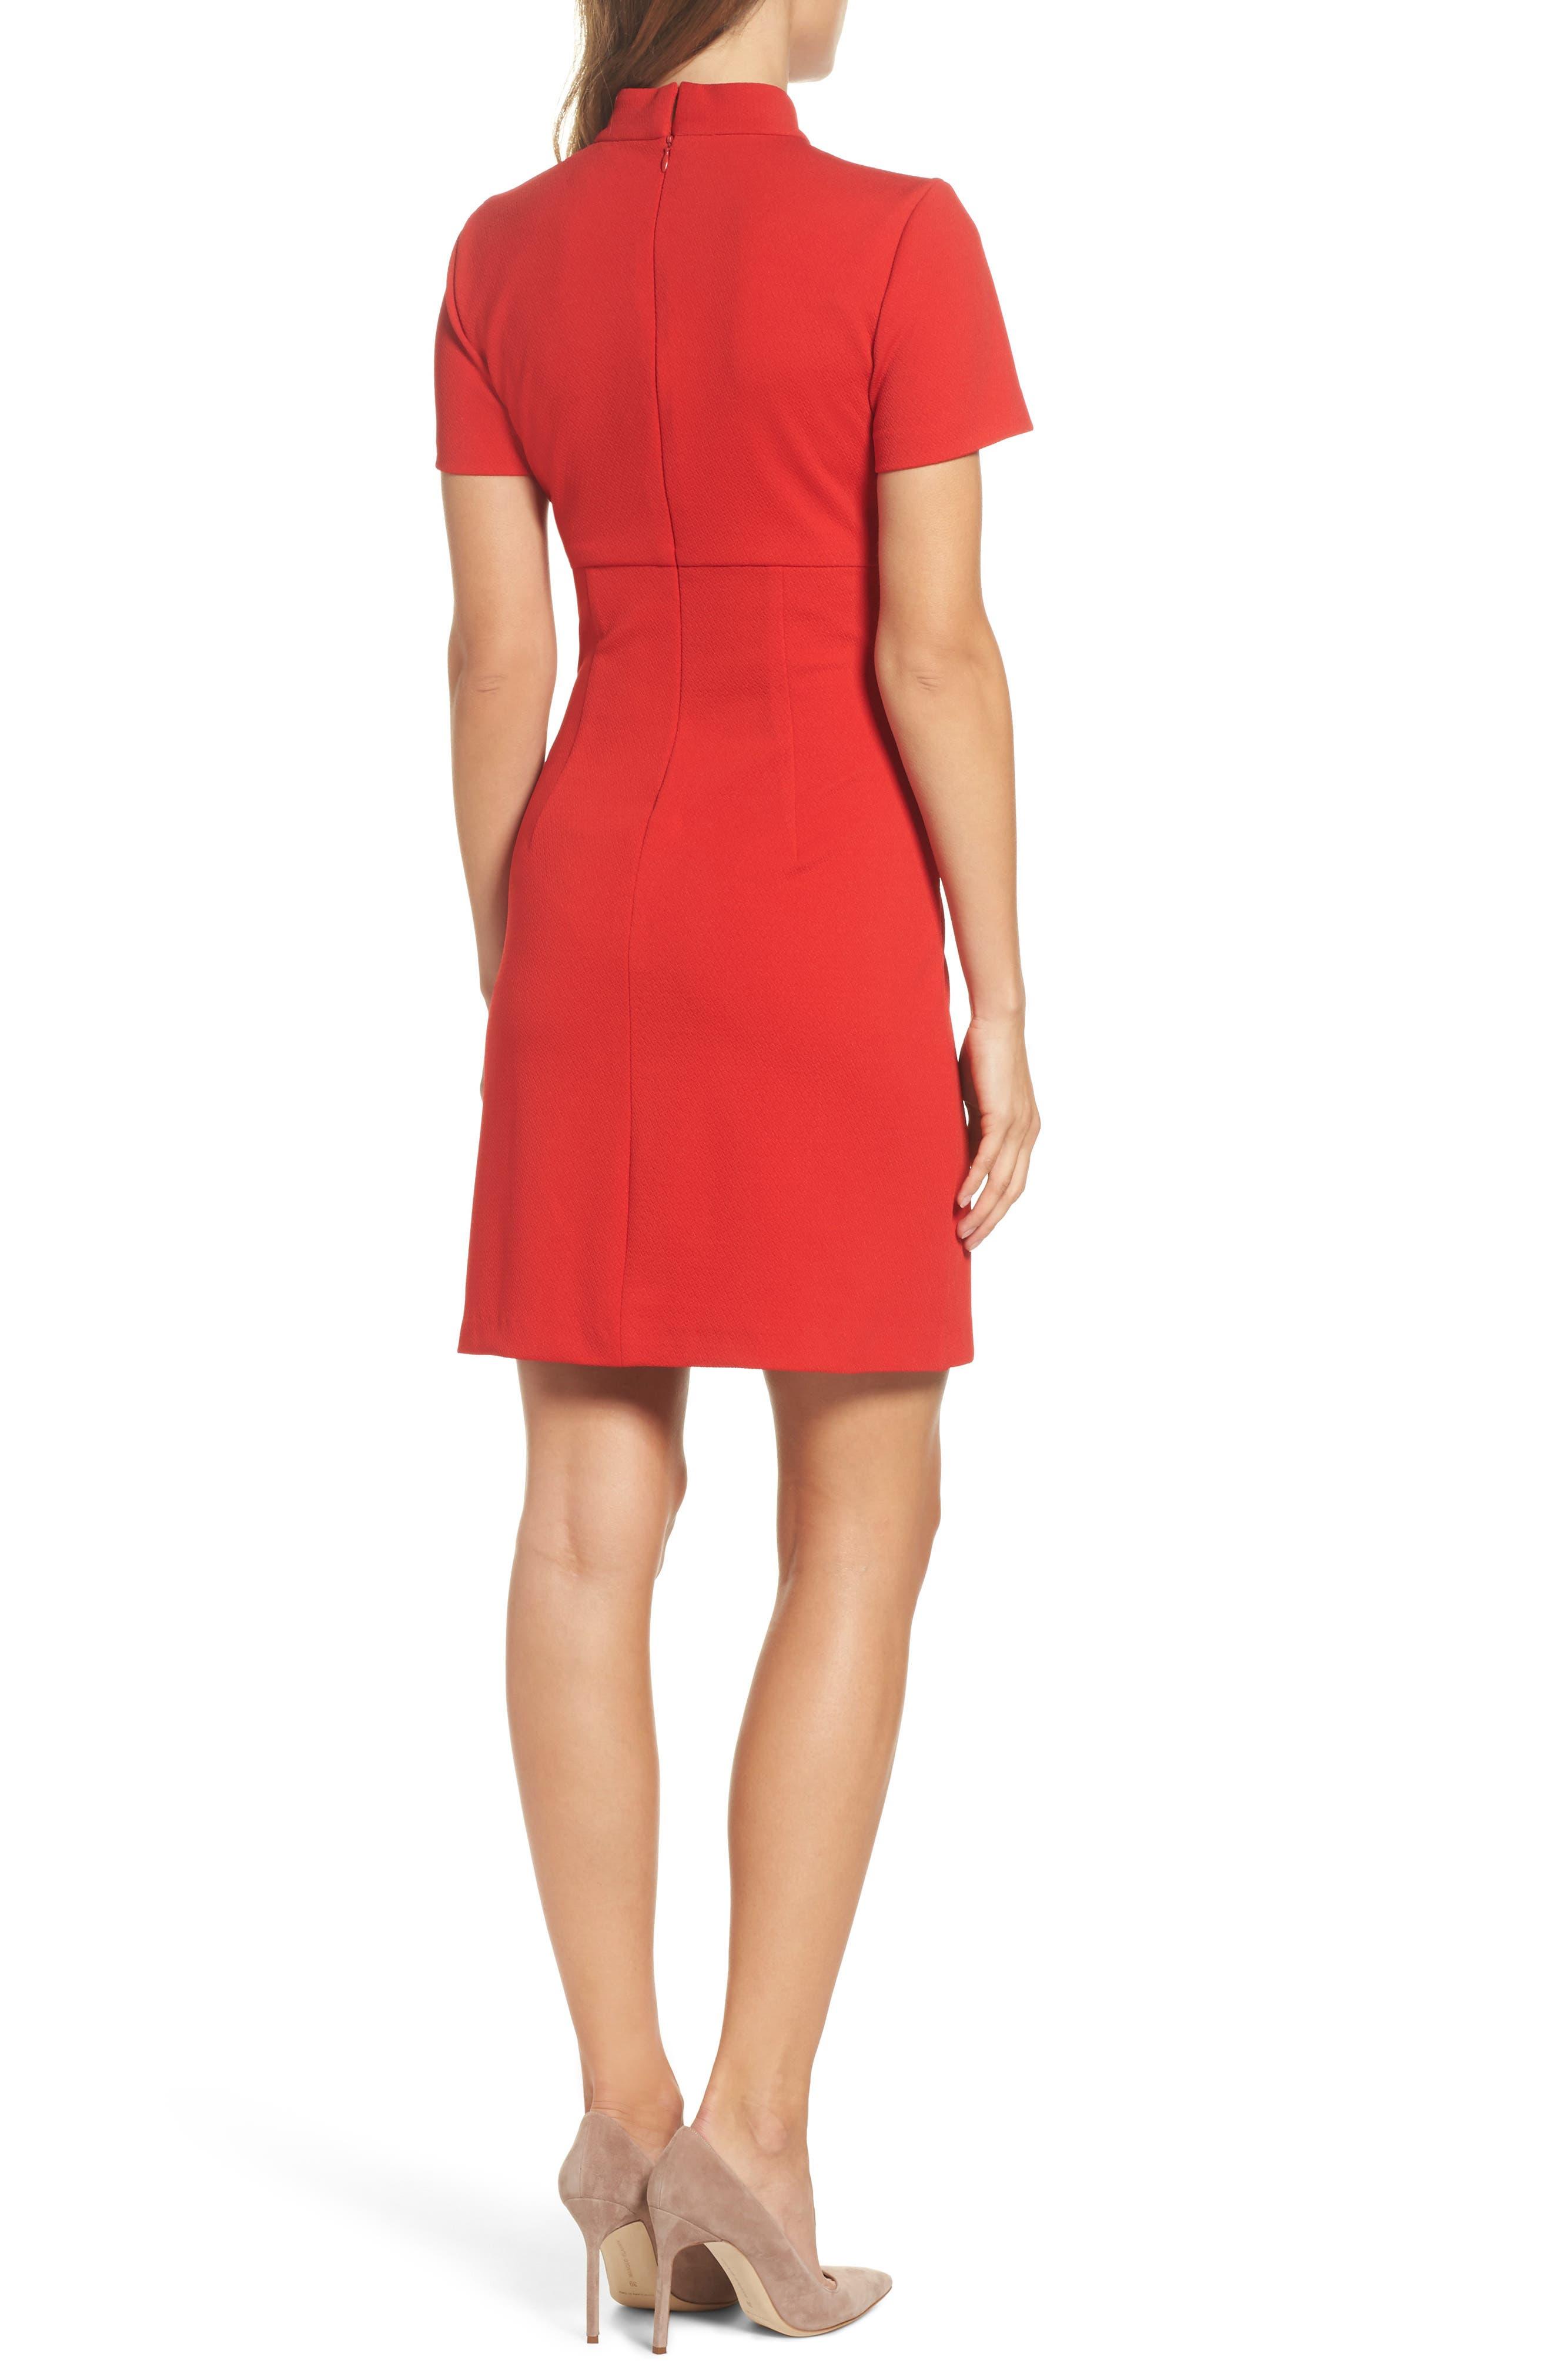 Camari Choker Collar Sheath Dress,                             Alternate thumbnail 2, color,                             Pagoda Red